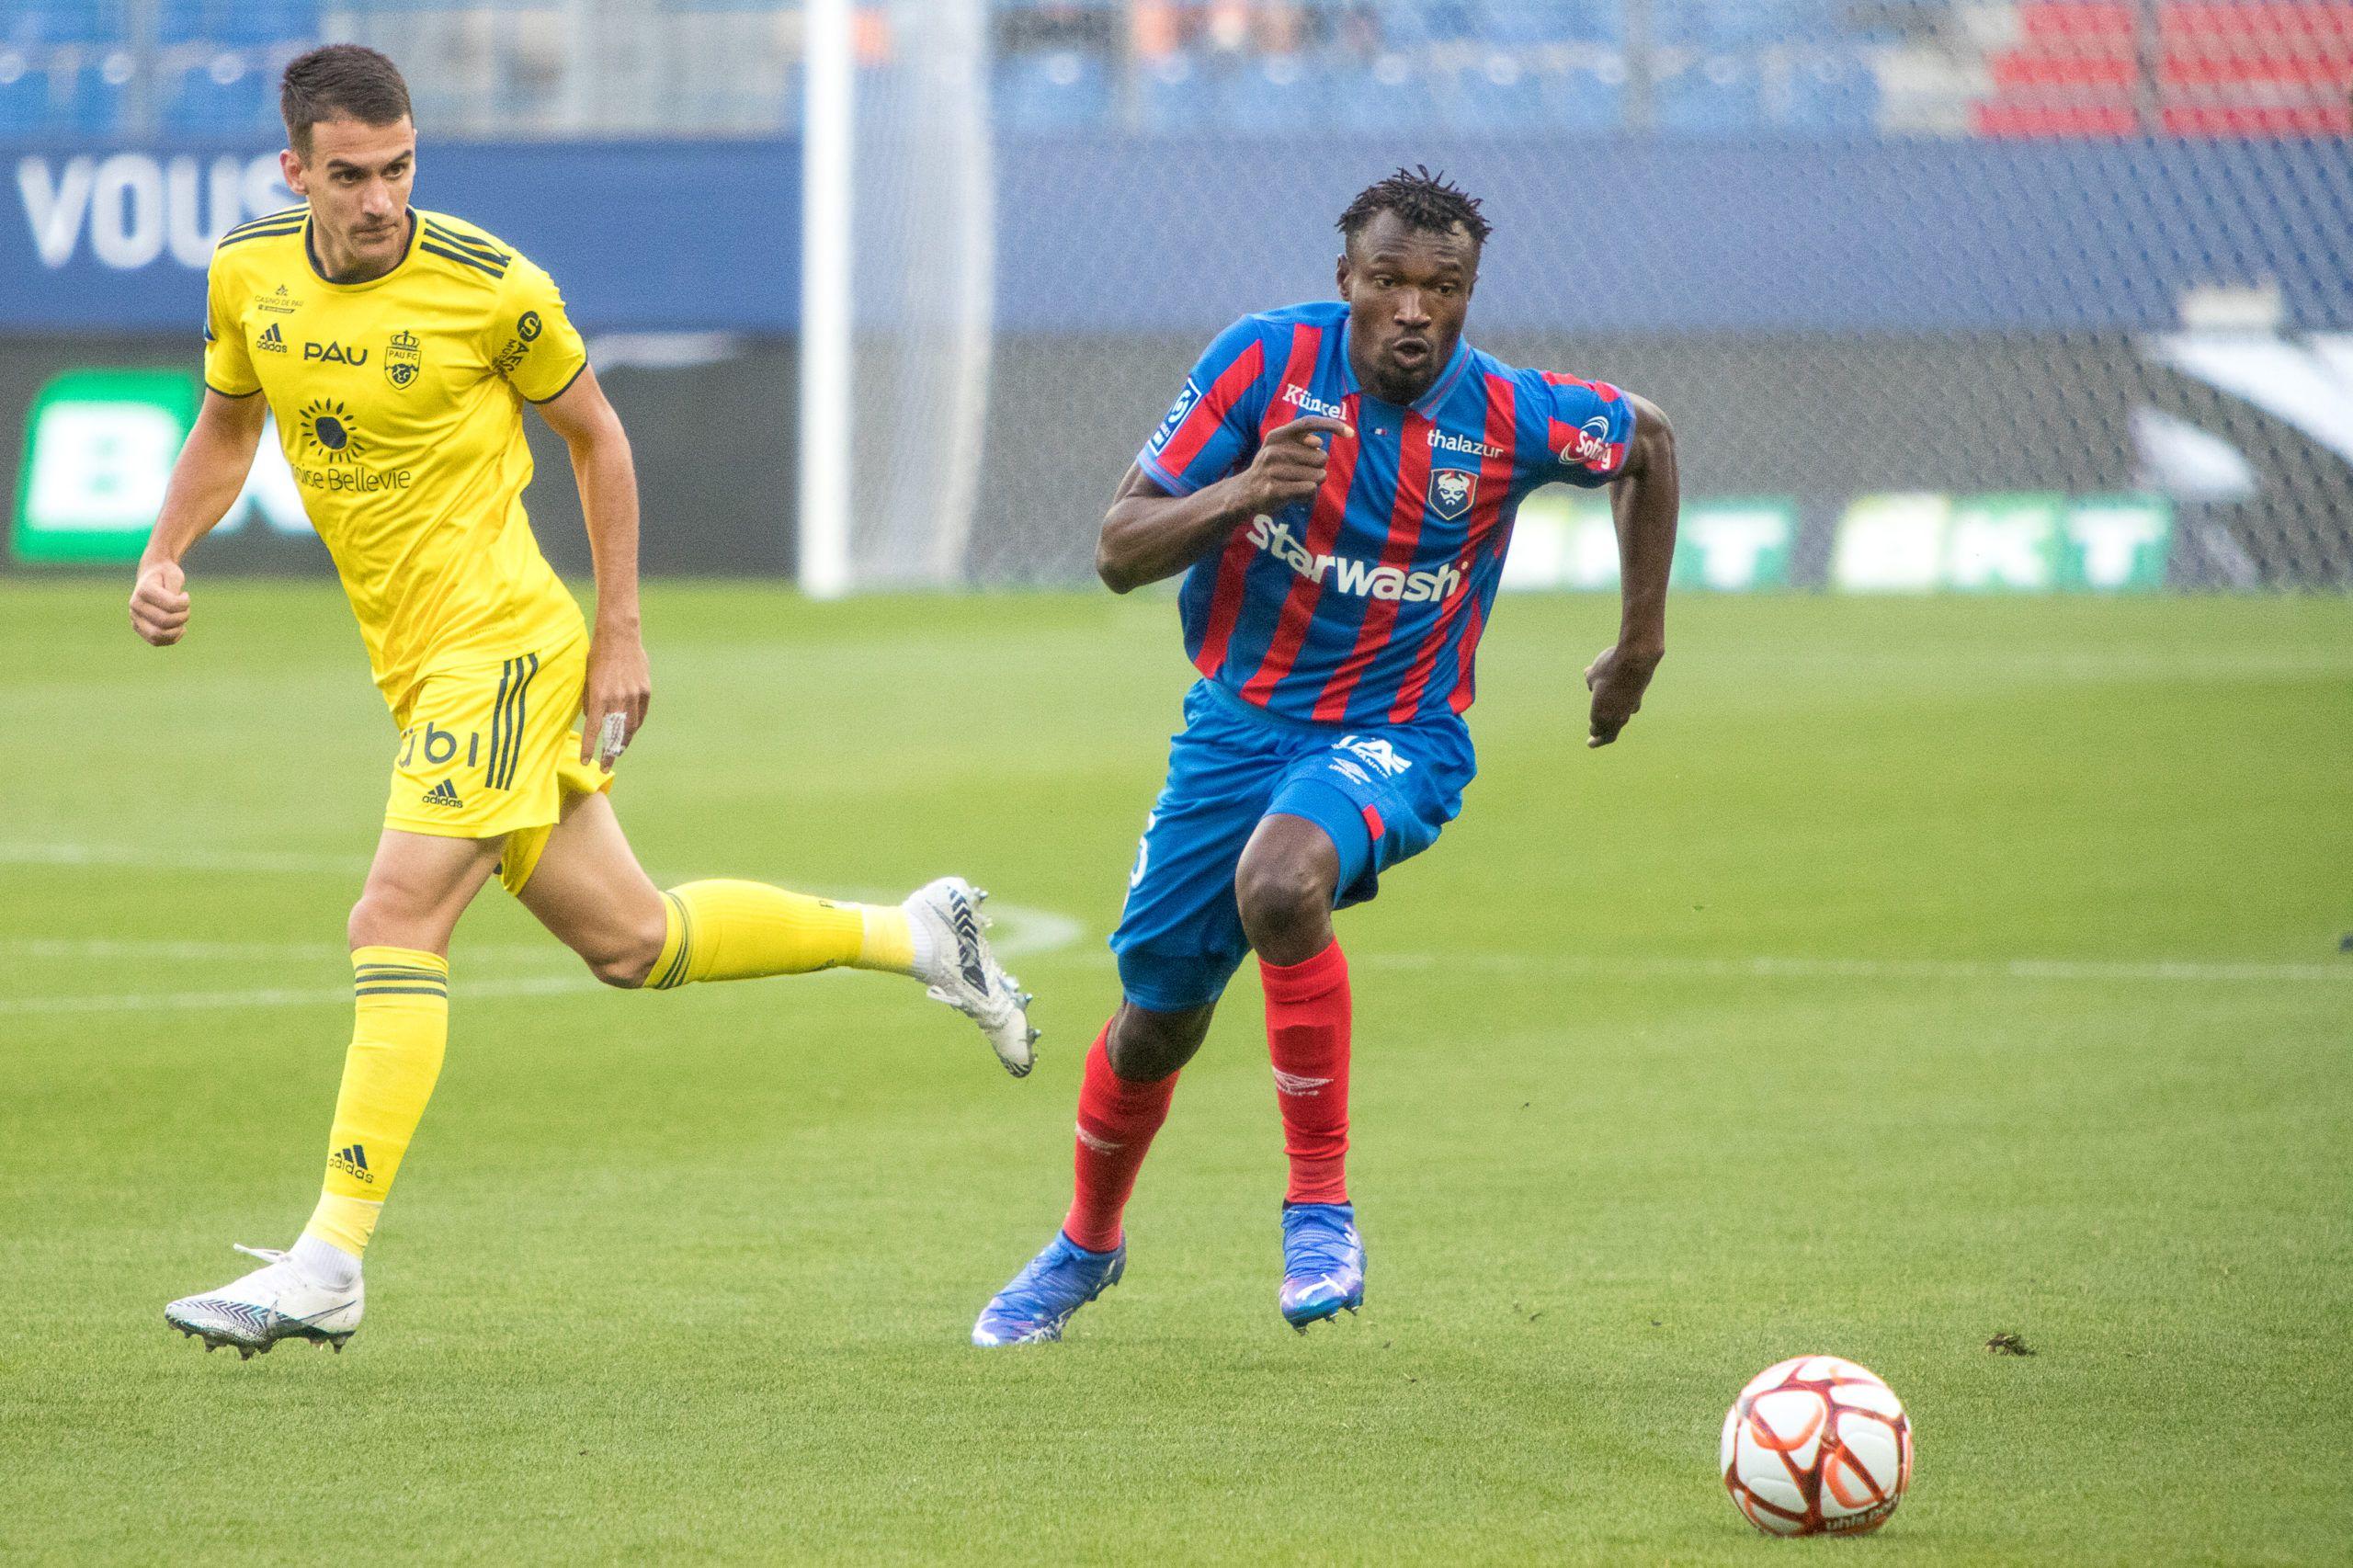 Franklin Wadja : « Avec la VAR, on aurait pu gagner ce match »